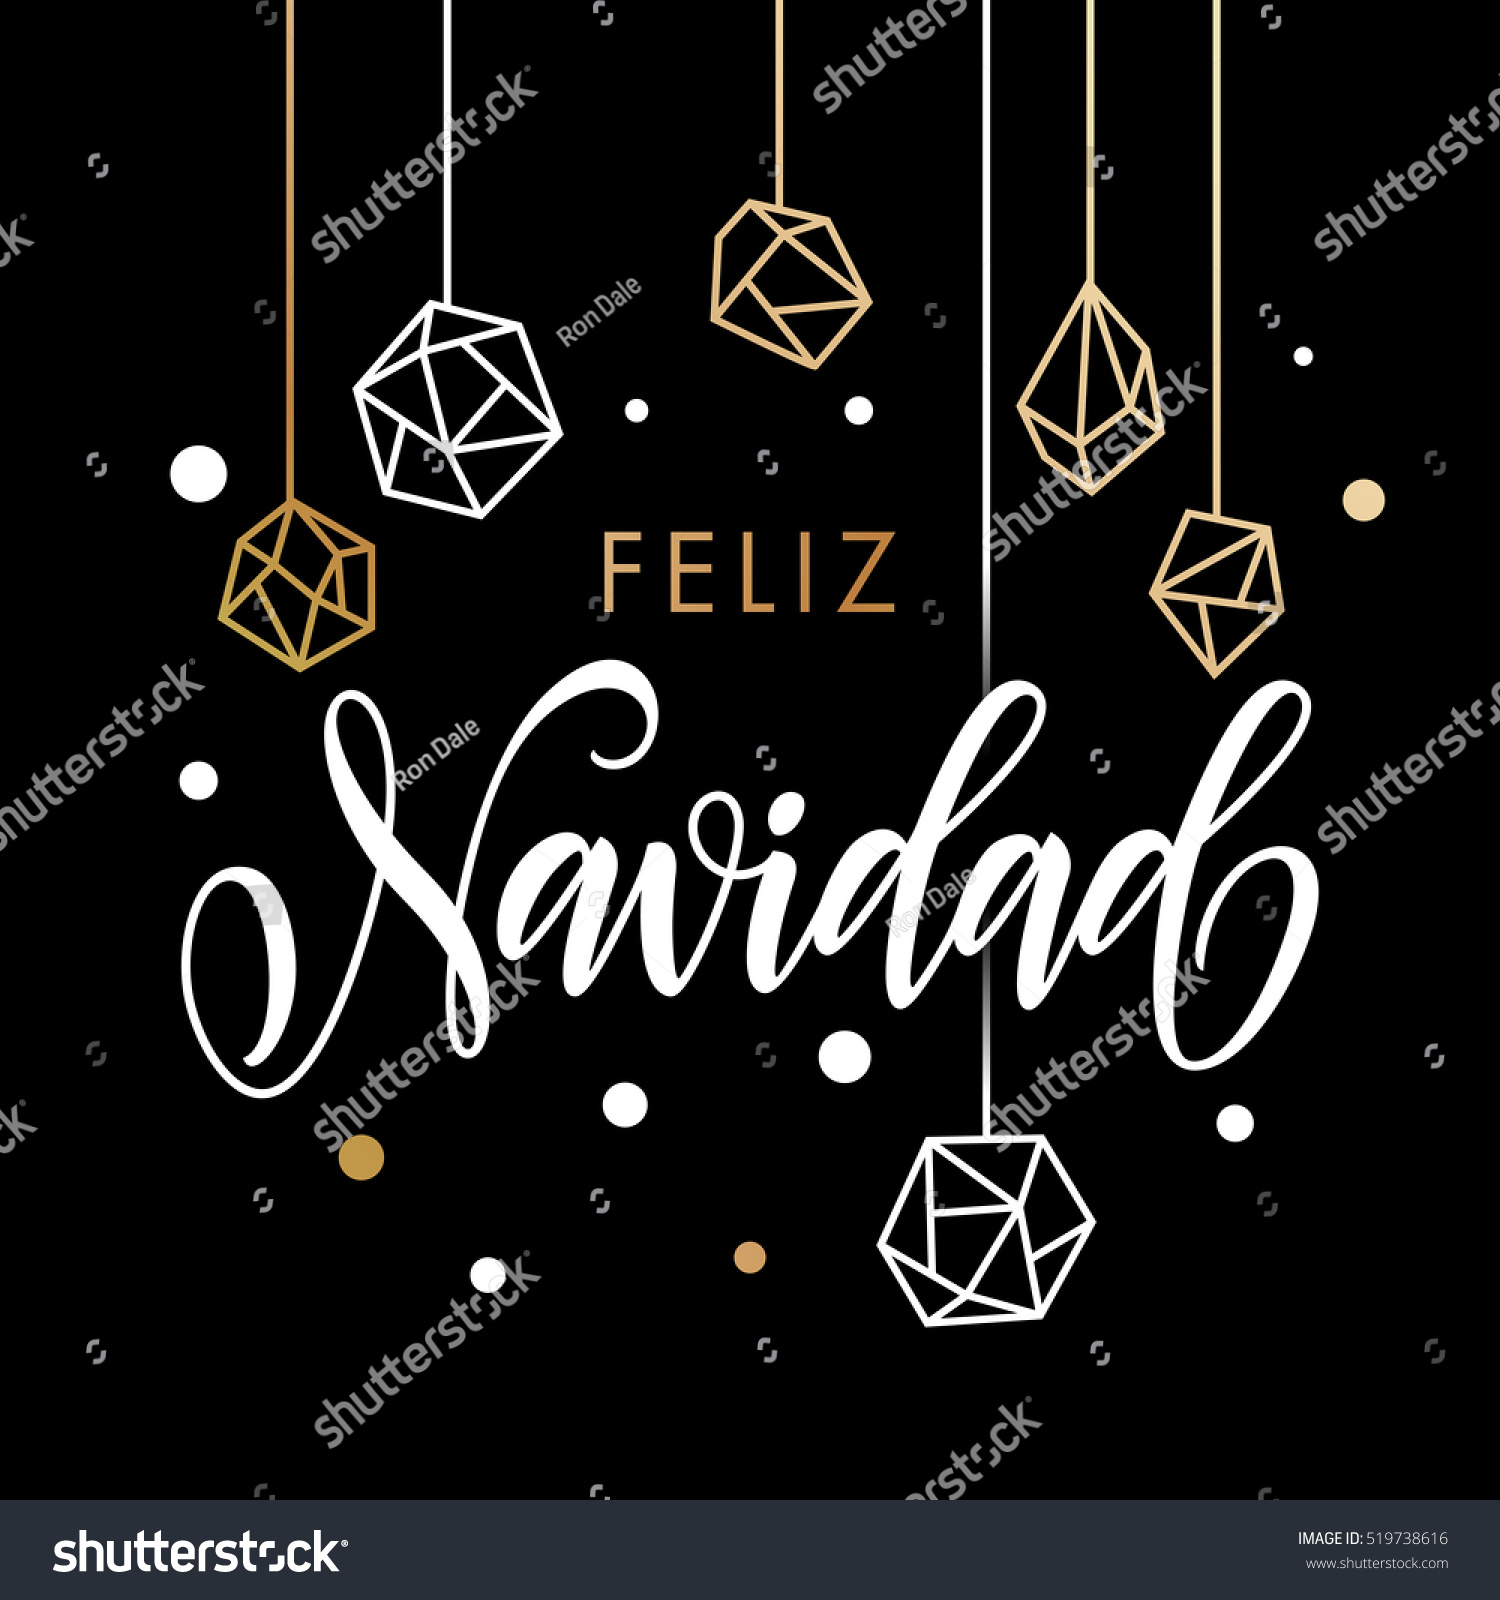 Spanish Merry Christmas Feliz Navidad Greeting Stock Vector (Royalty ...